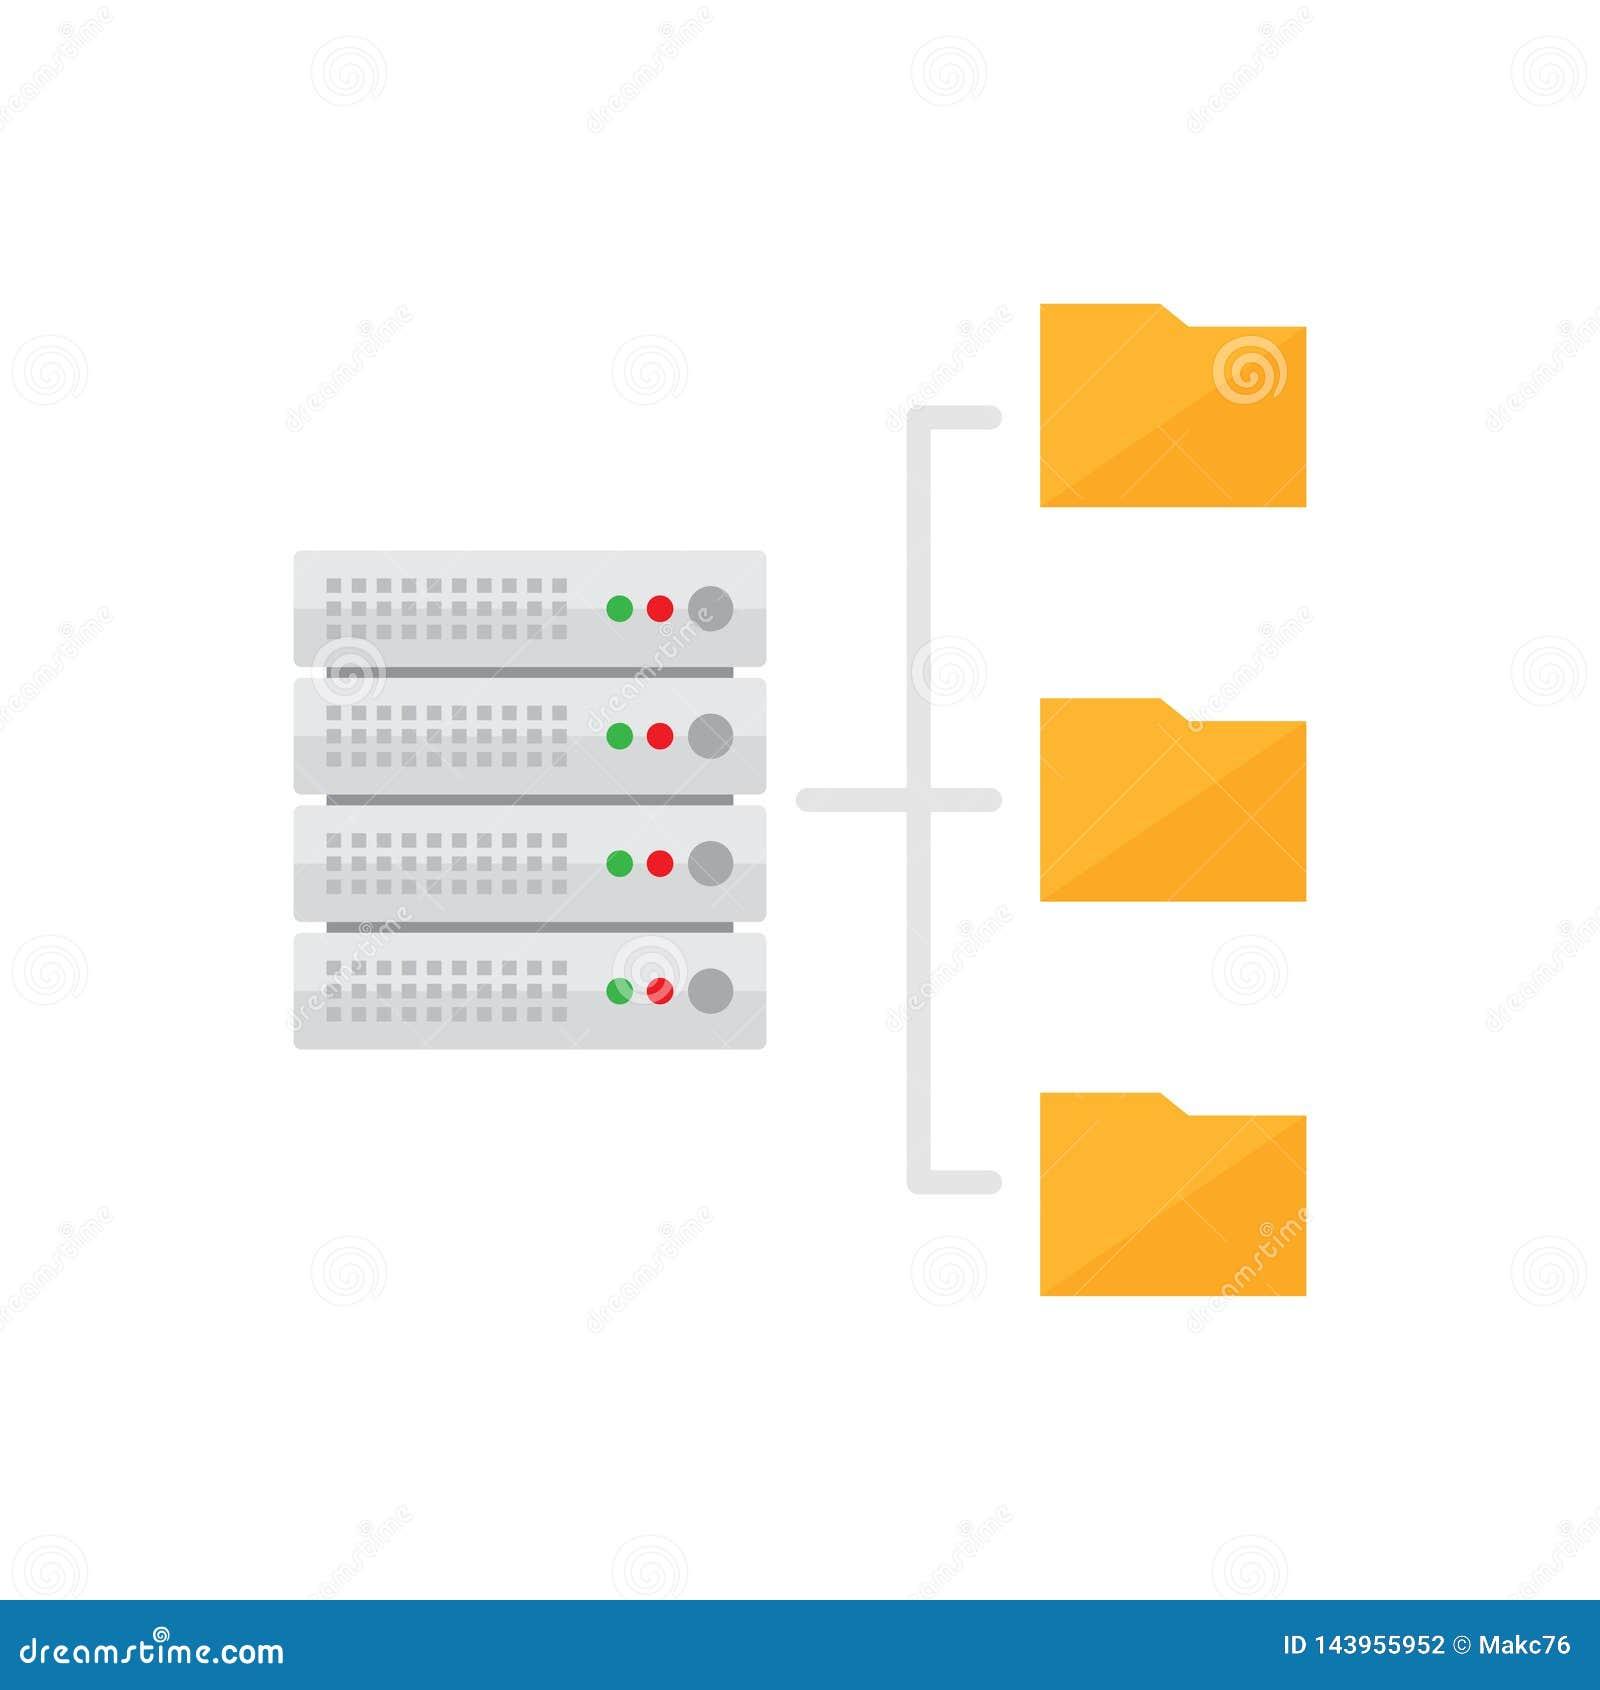 хостинг серверов кс цена